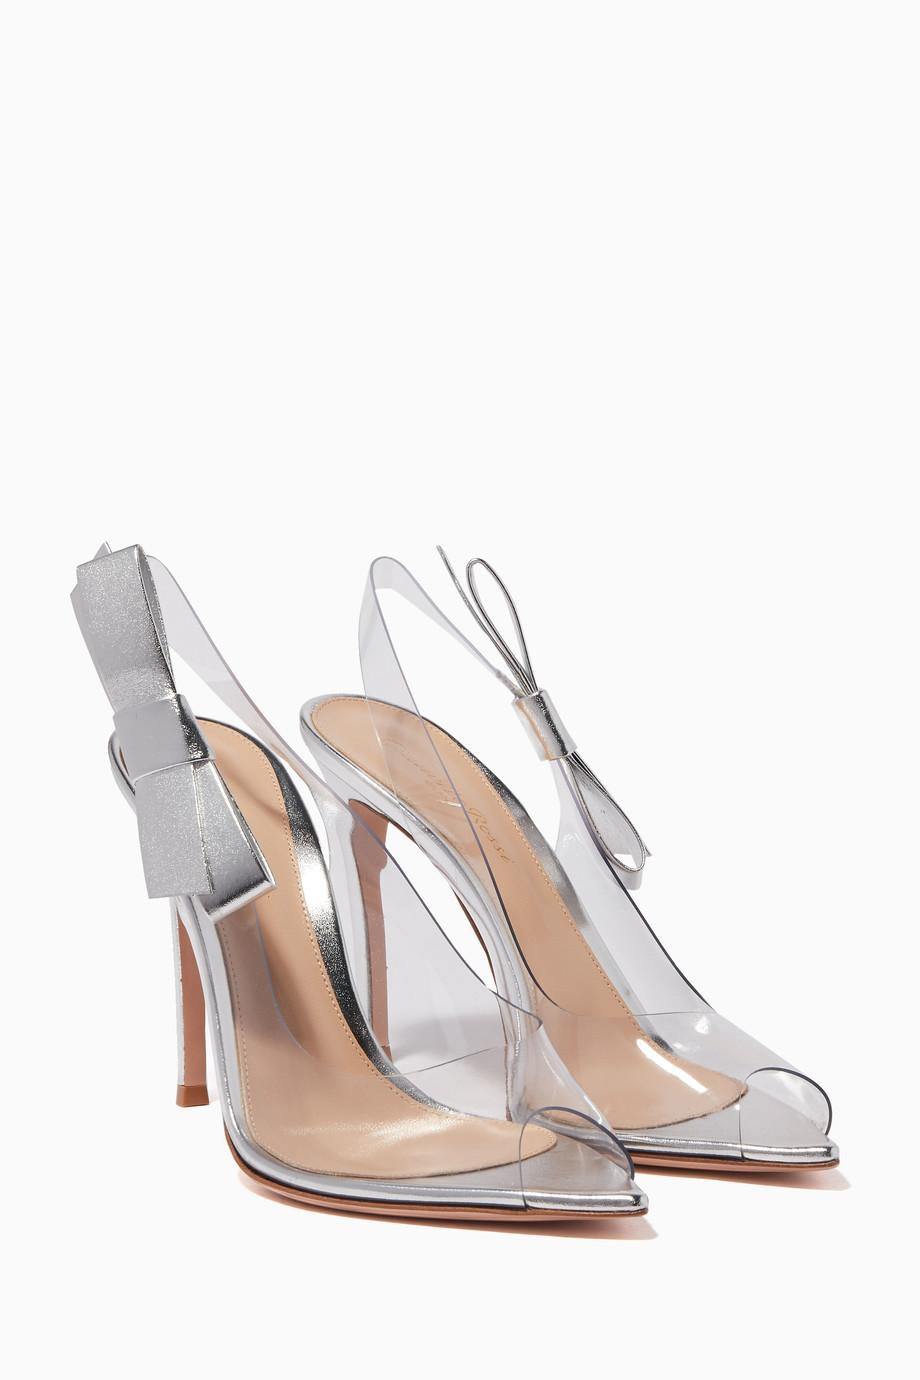 cdecfb84596d Shop Gianvito Rossi Silver Silver Valentina PVC Sandals for Women ...